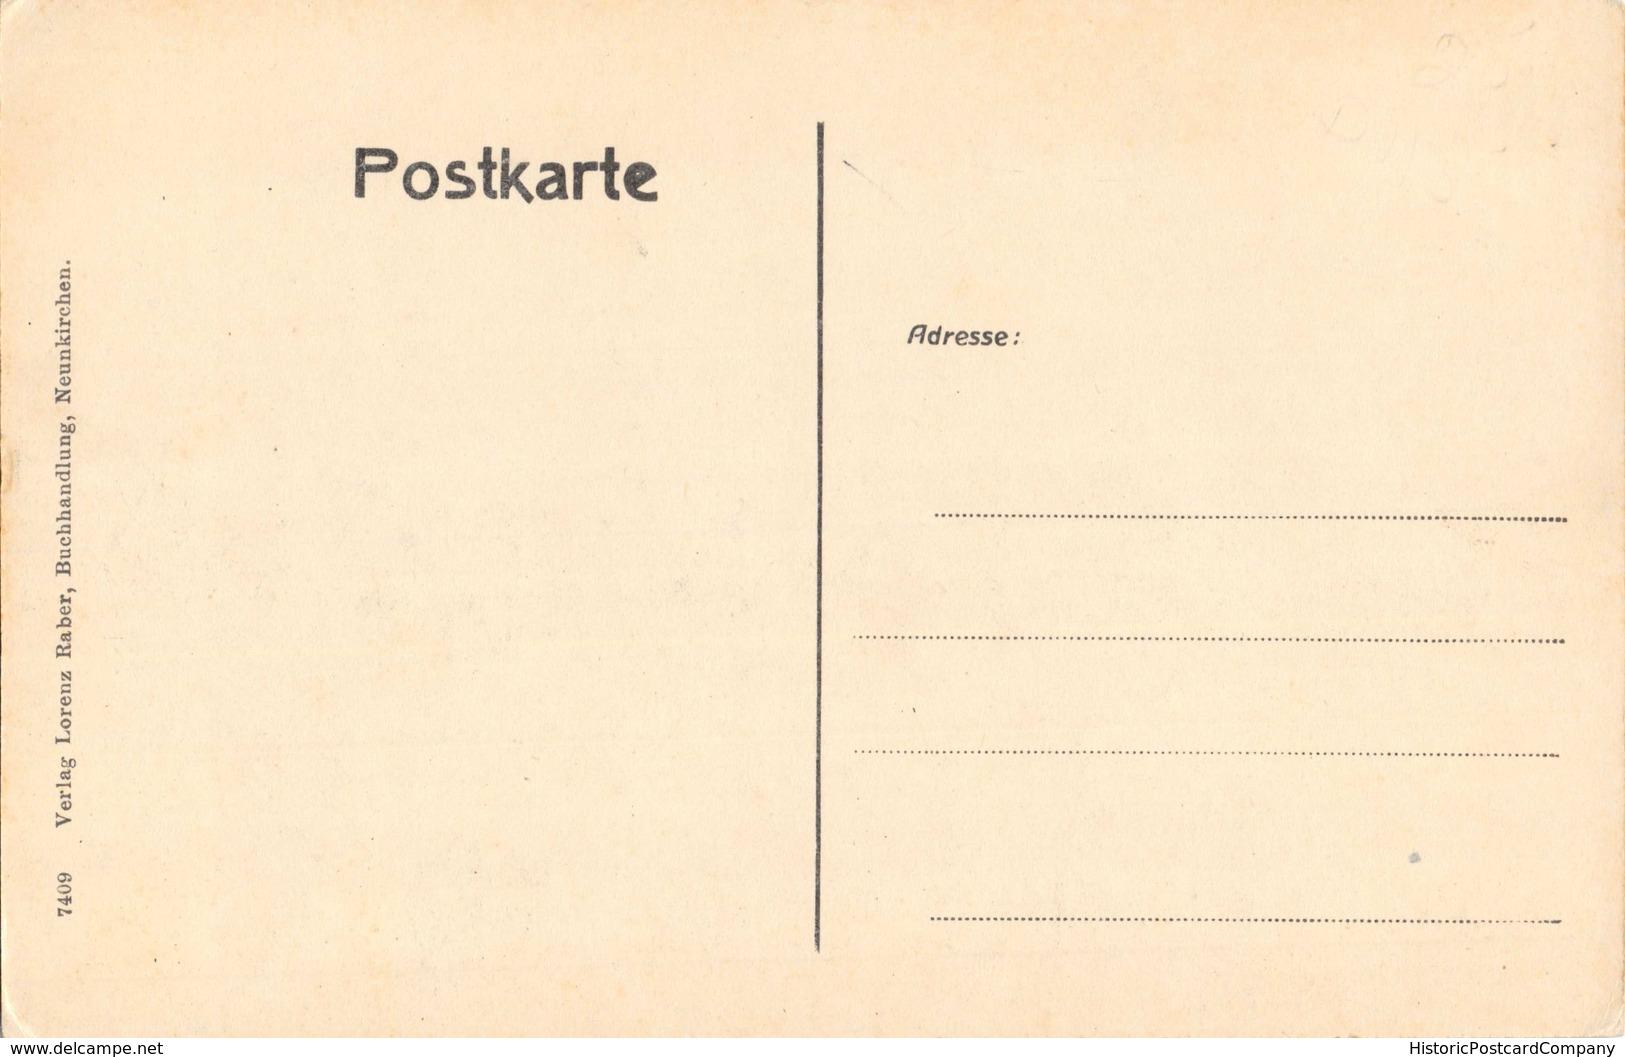 NEUNKIRCHEN BEZ TRIER GERMANY~KAISER WILHELM-OBERER MARKT-L RABER PHOTO POSTCARD 35411 - Autres